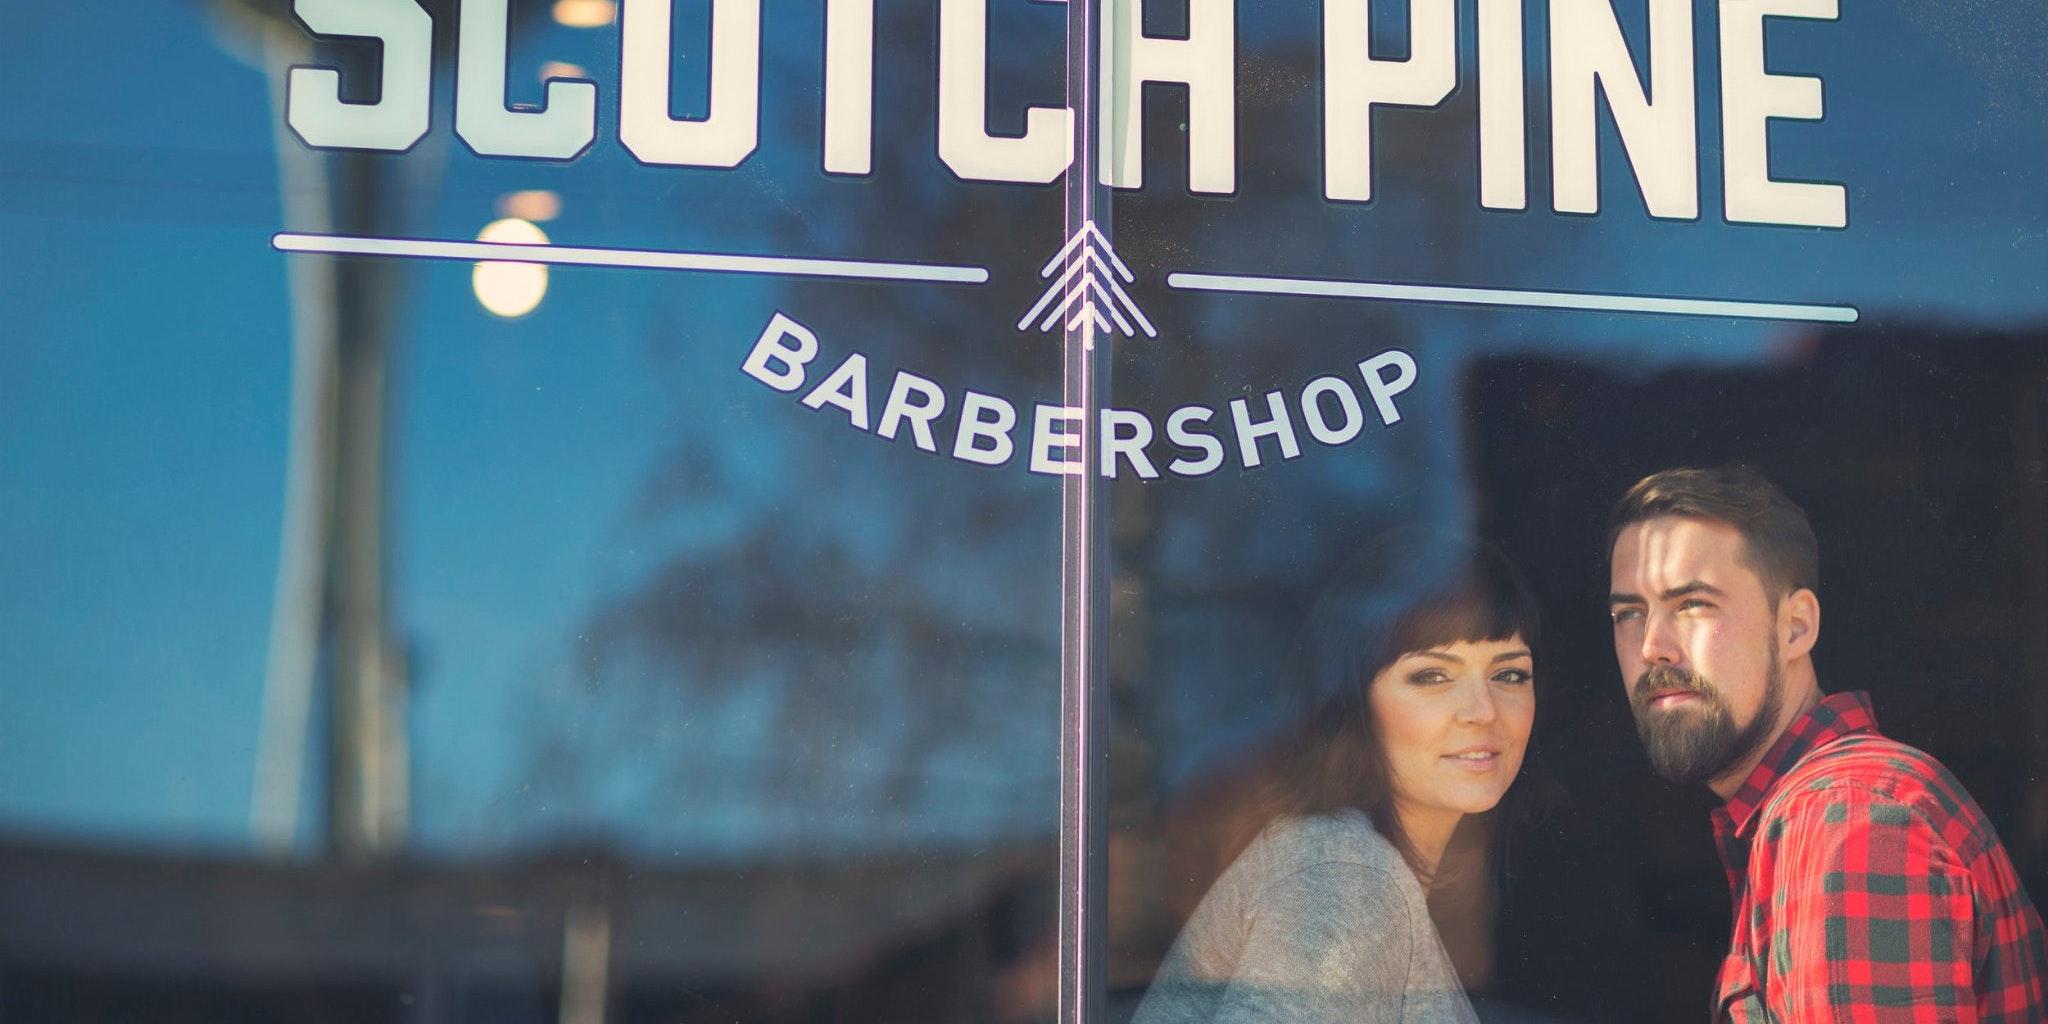 The Scotch Pine Barbershop